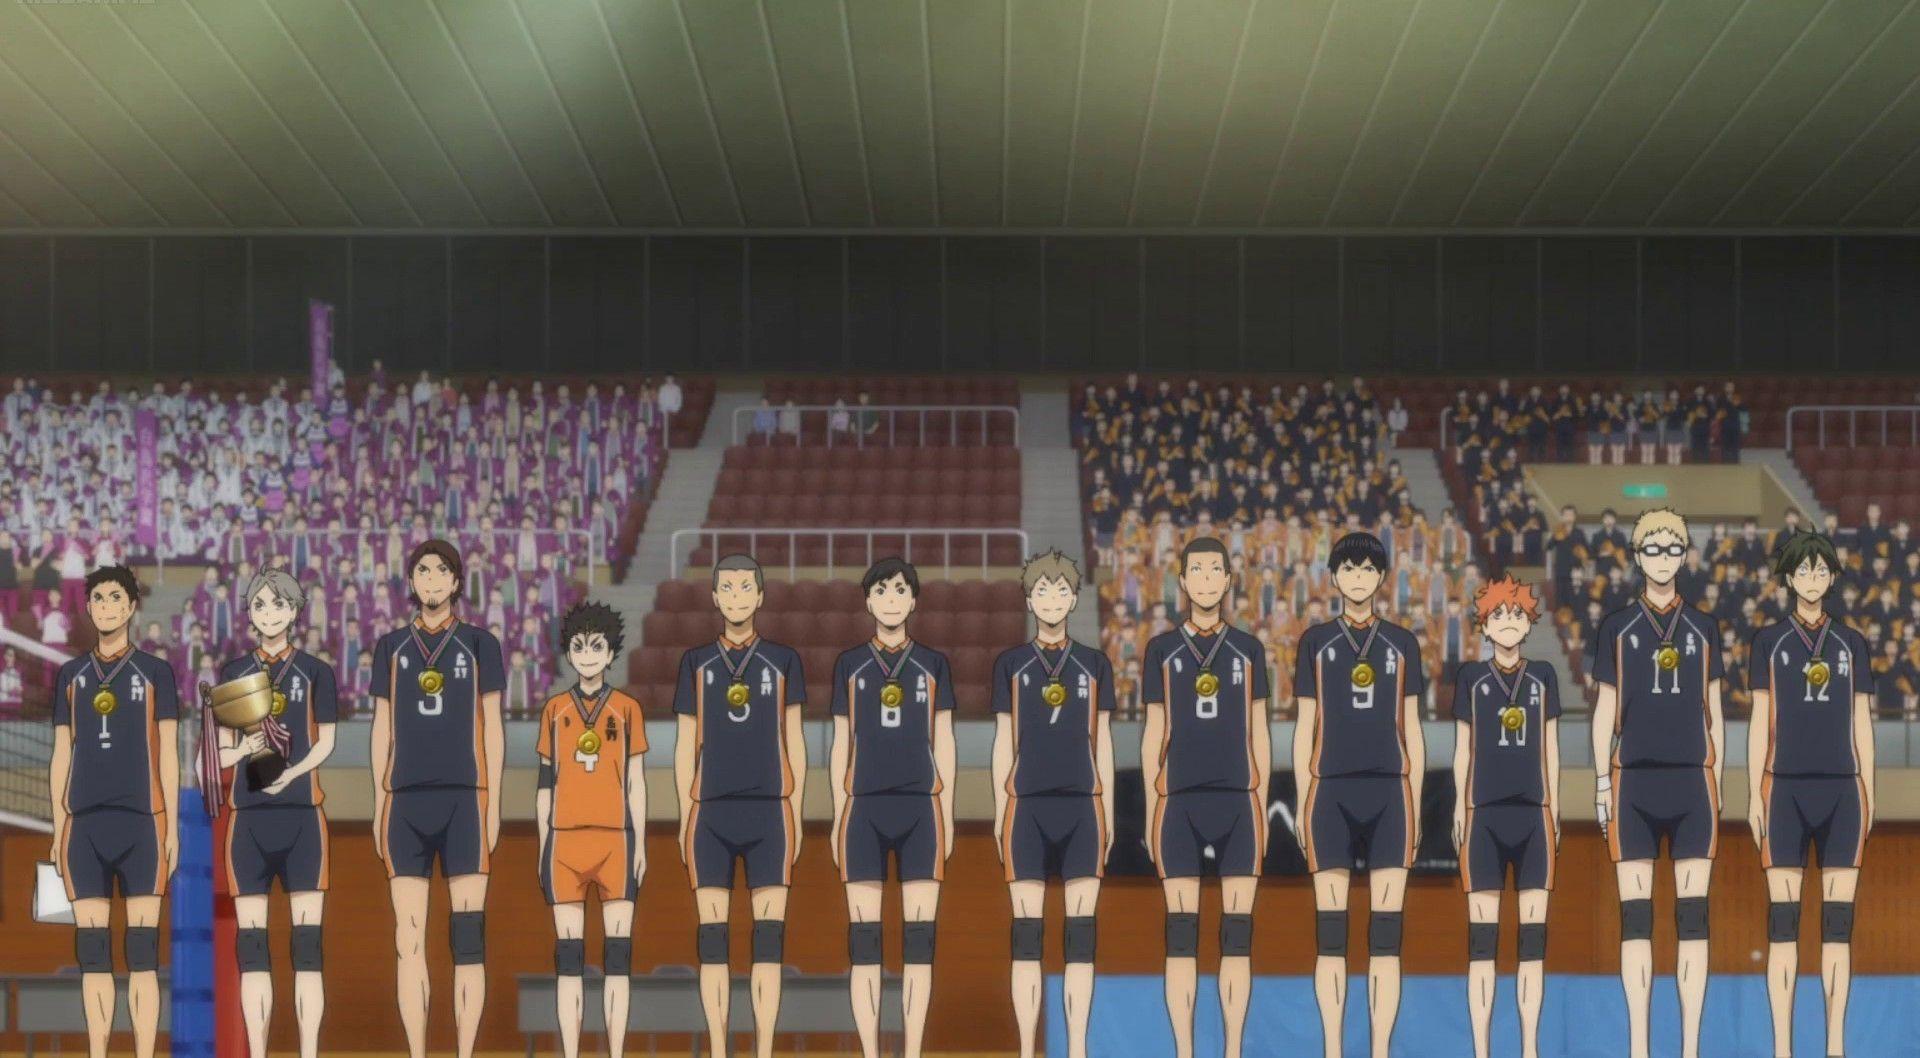 Kurasuno High In 2020 Haikyuu Soccer Field Haikyu